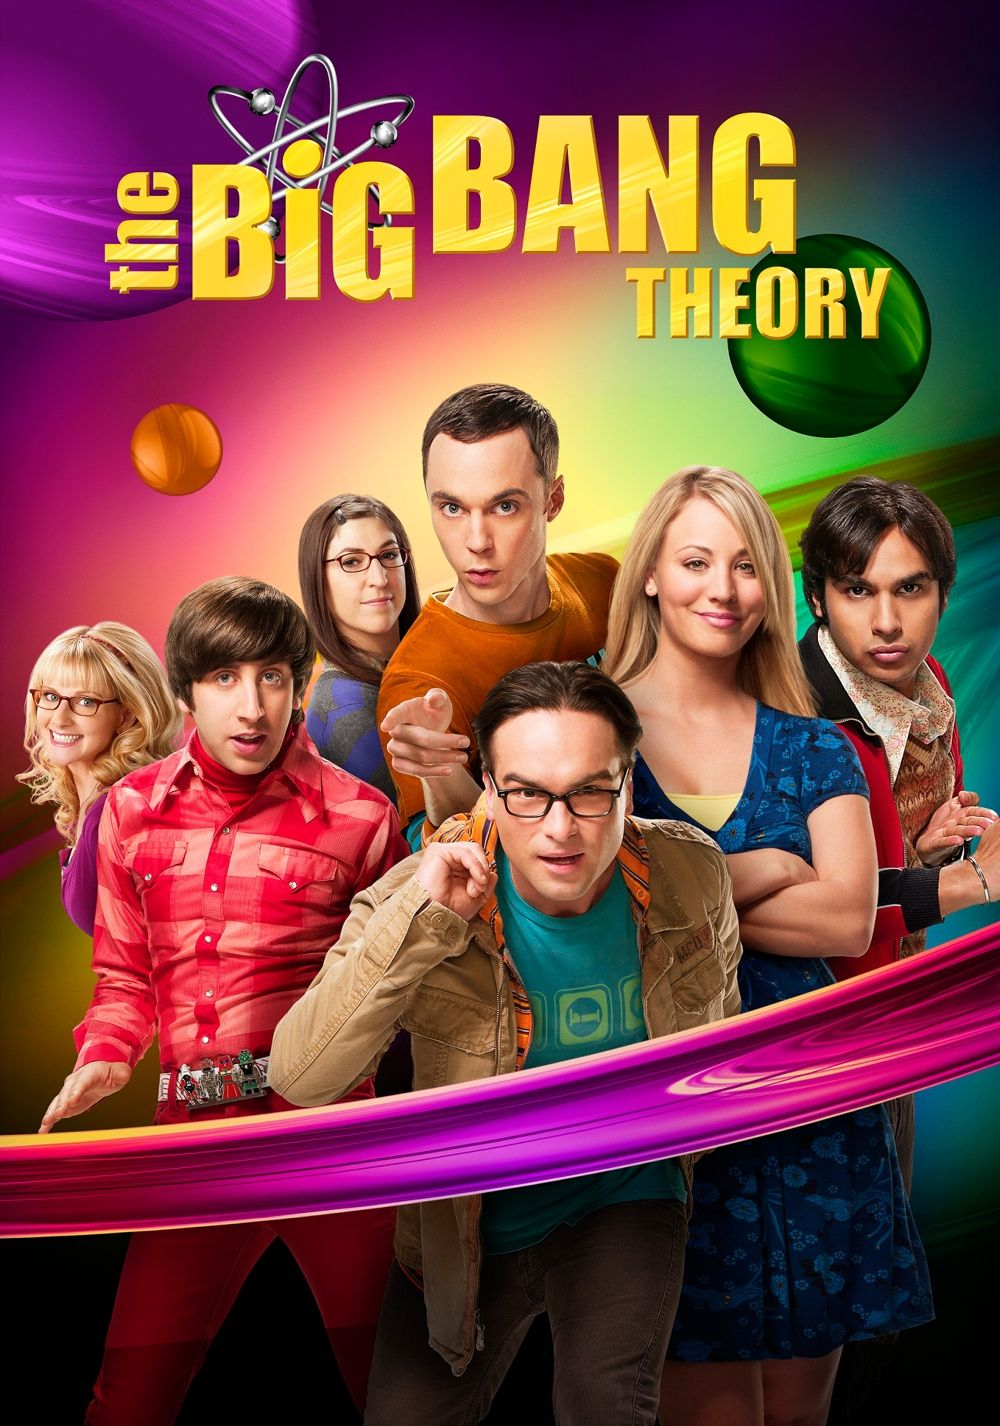 Bs.To The Big Bang Theory